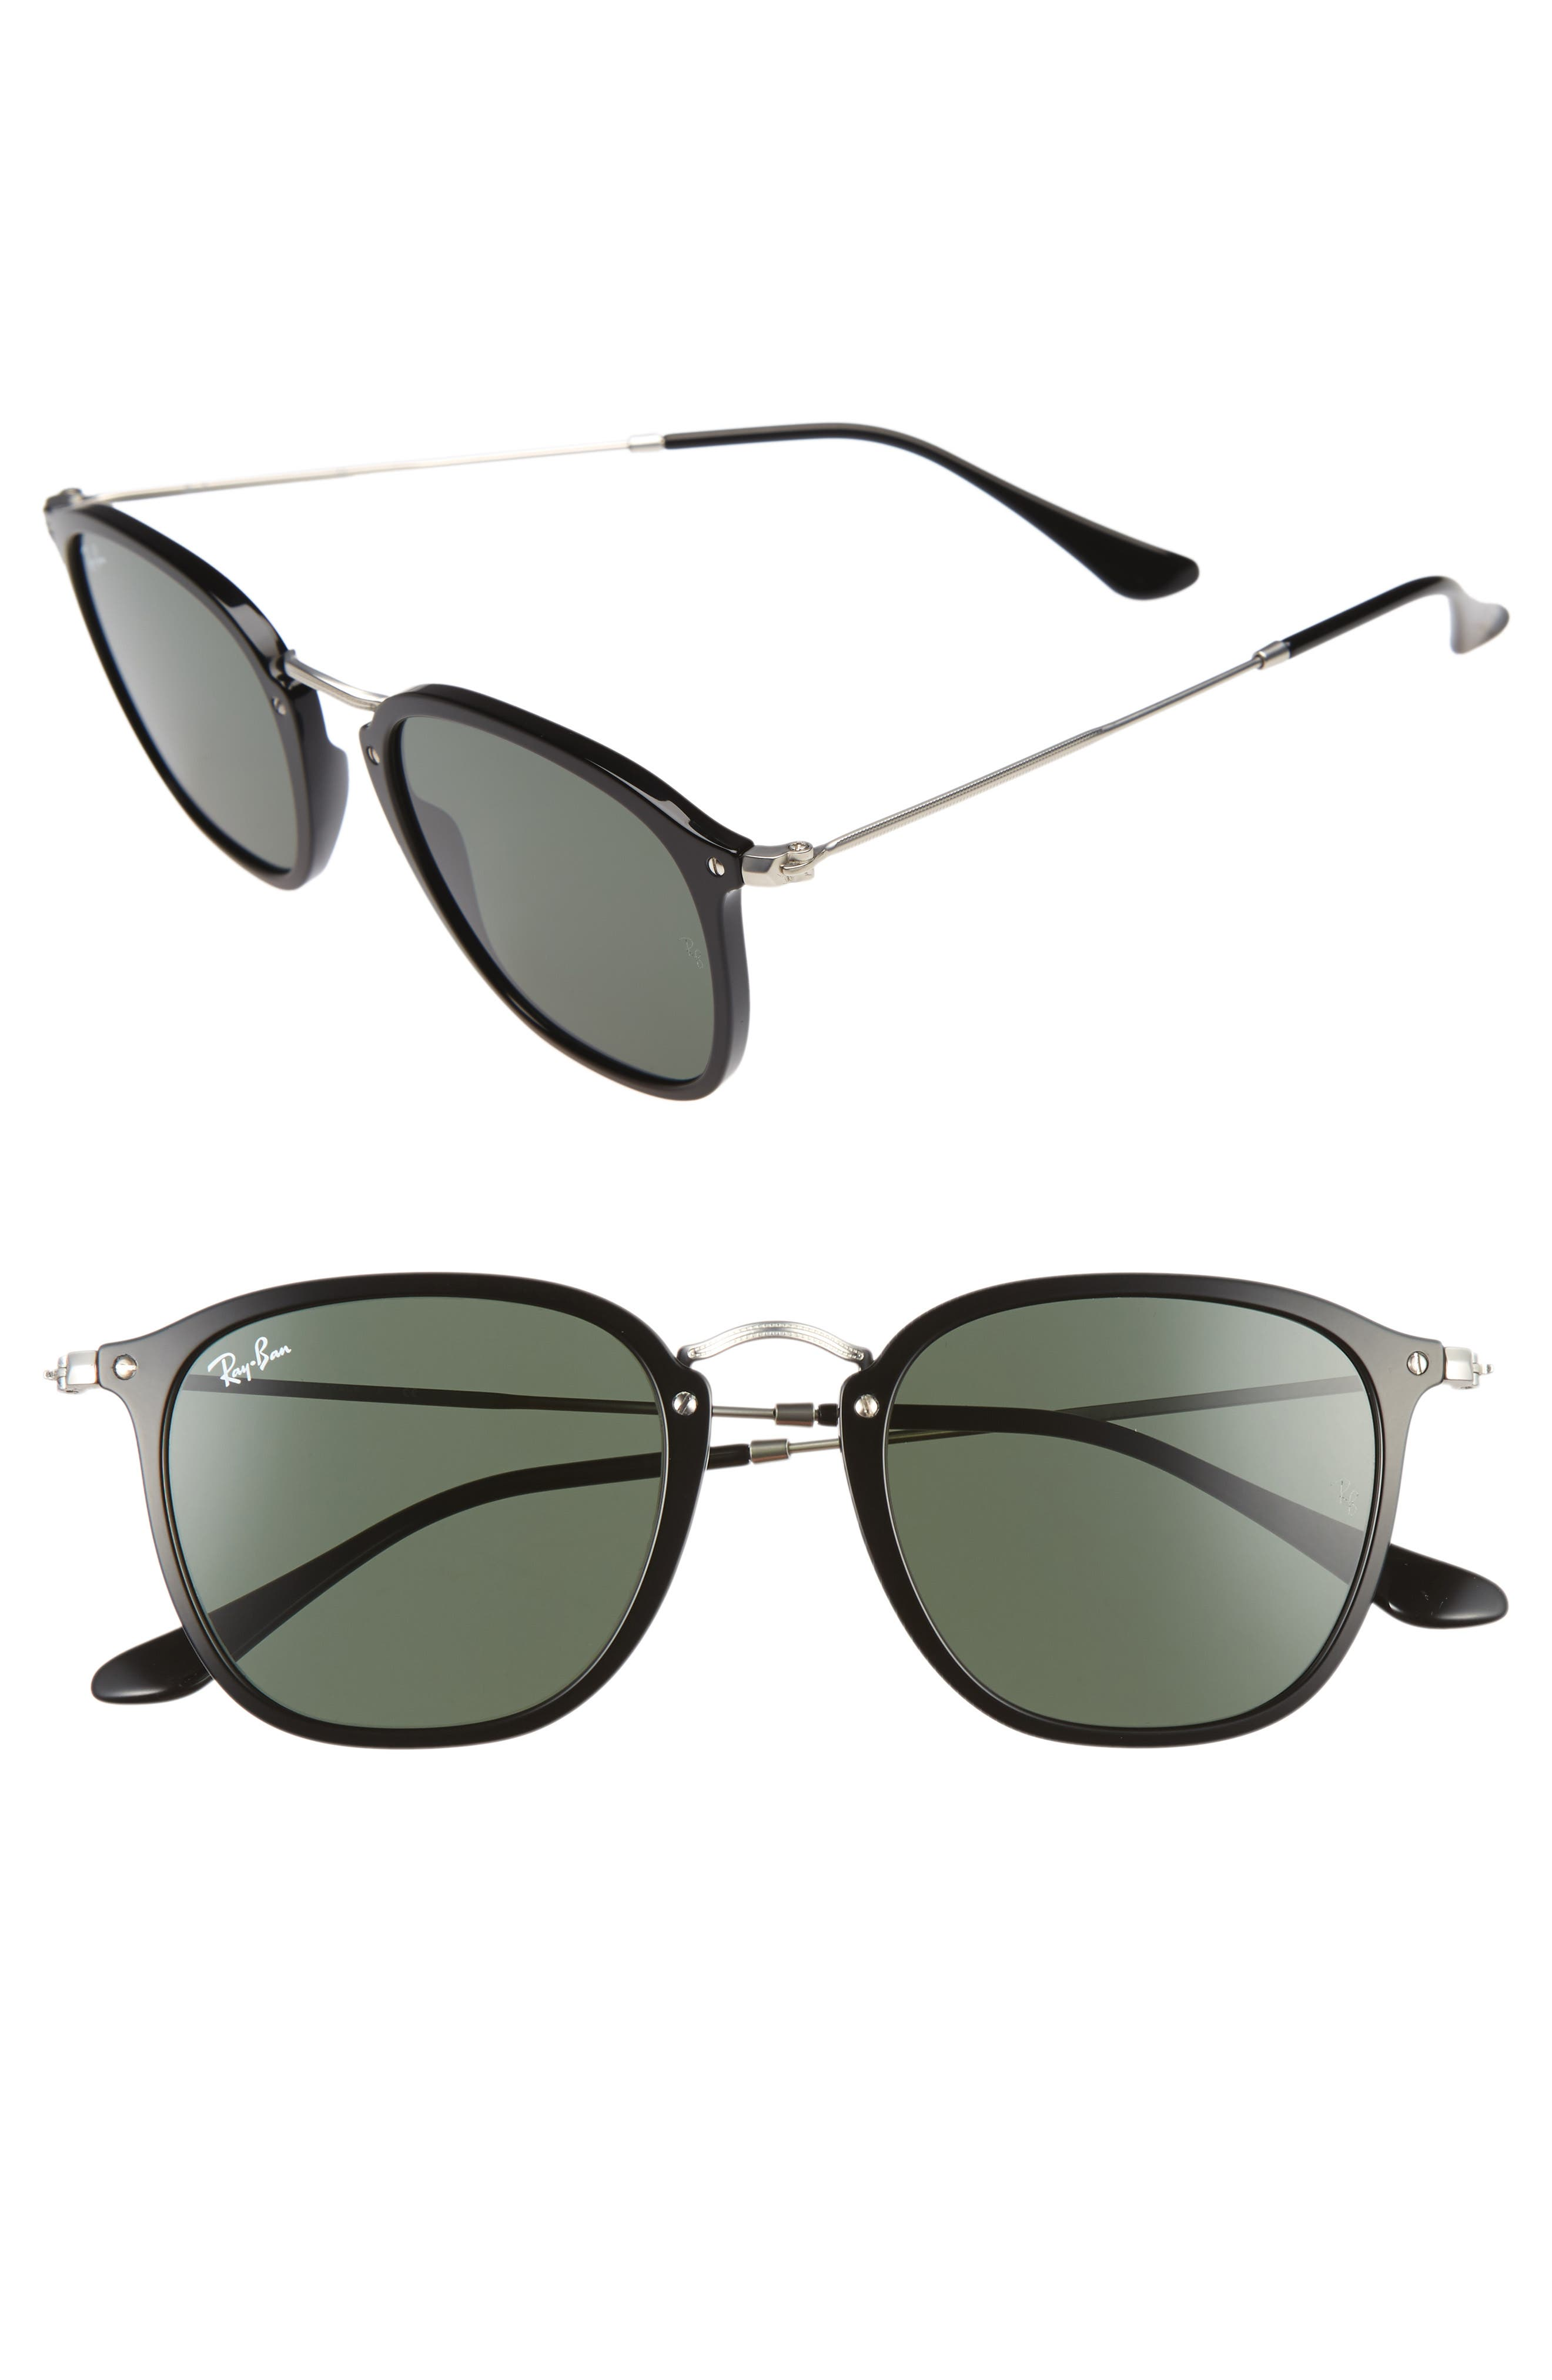 Icons 51mm Aviator Sunglasses,                             Main thumbnail 1, color,                             001